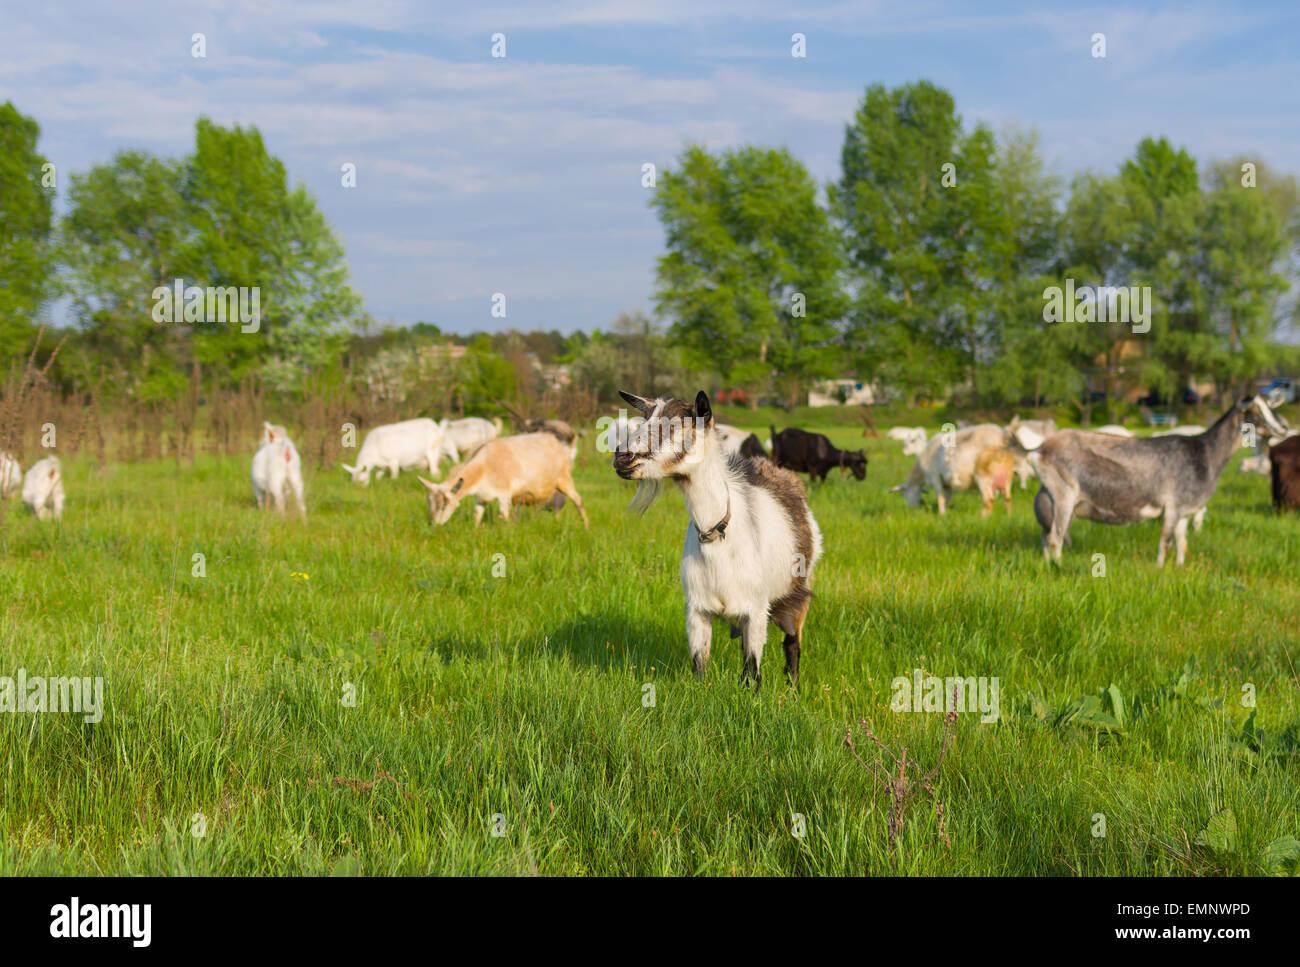 Ukrainian milk goats on a spring pasture (shalow dof) - Stock Image